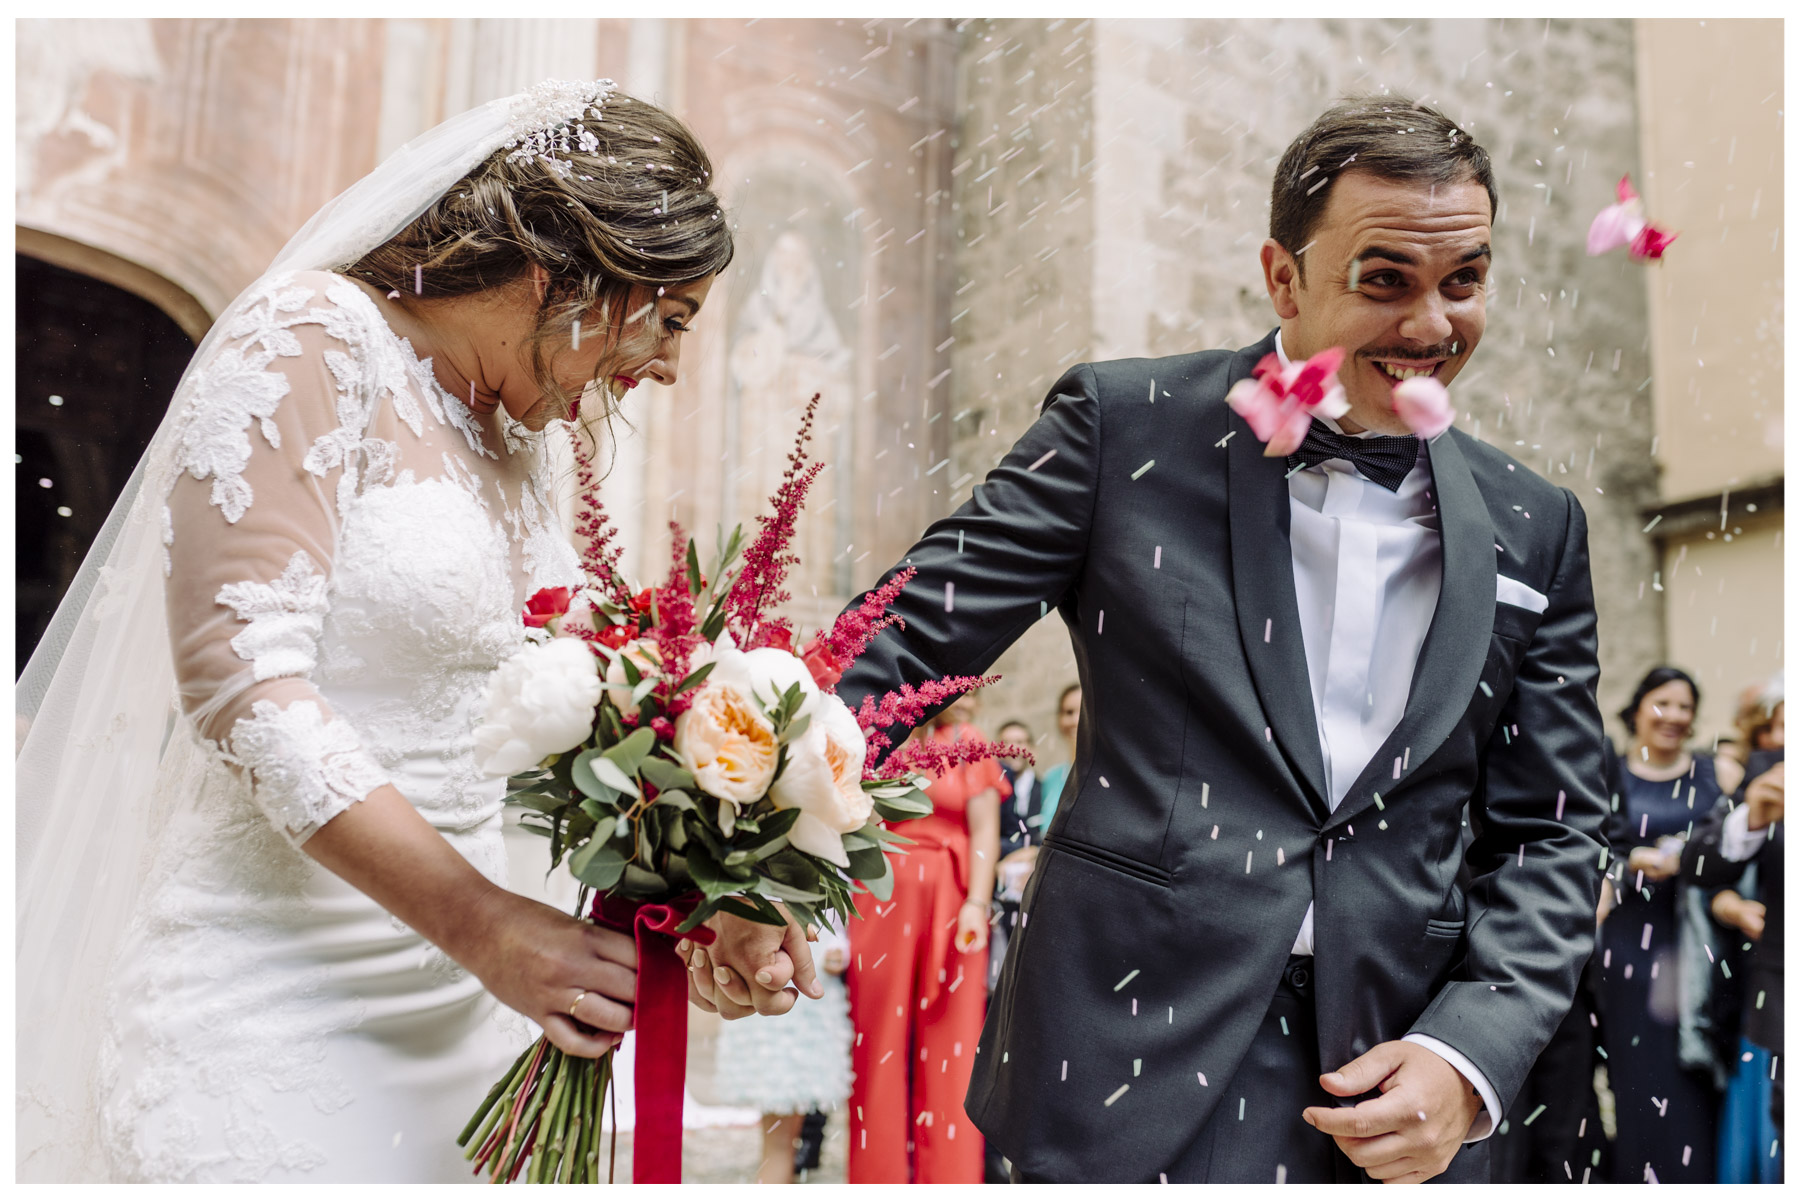 Boda Irene & Juan - Joseangelfoto - 1072.jpg